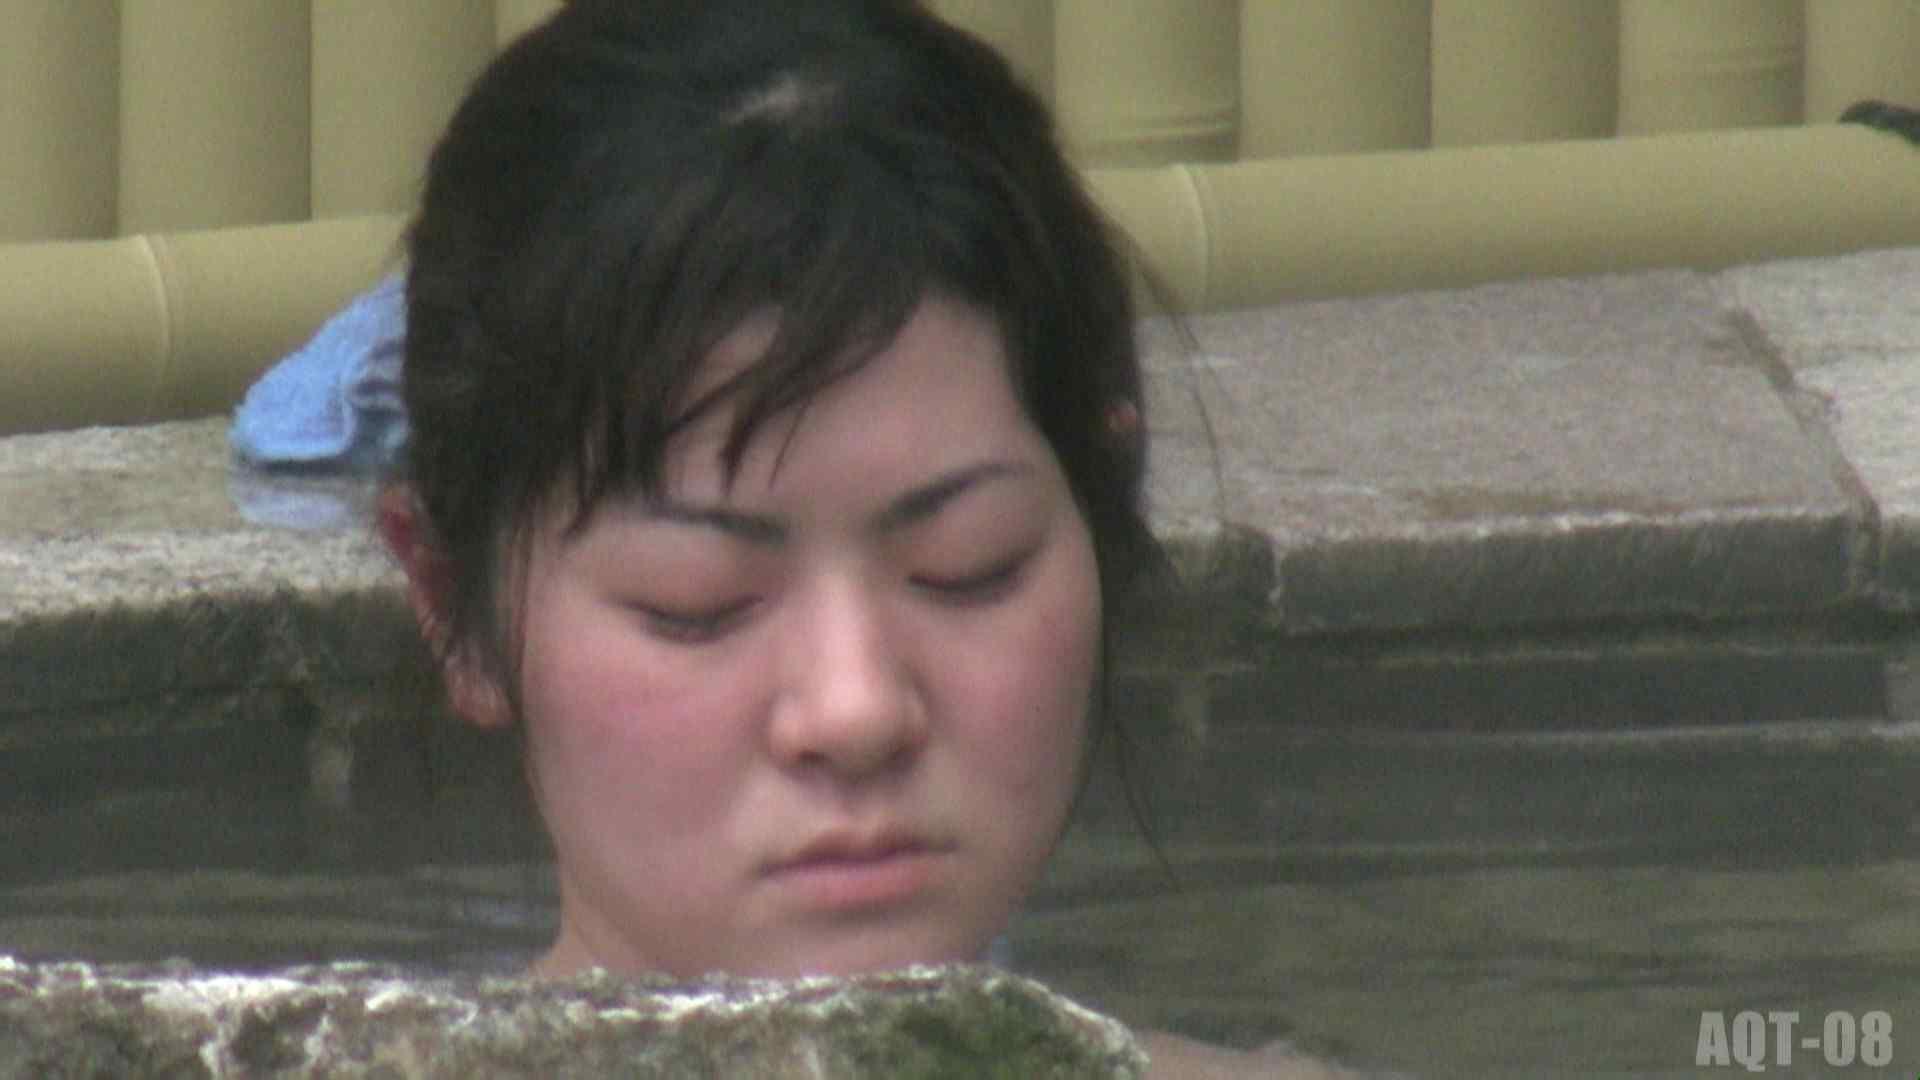 Aquaな露天風呂Vol.774 HなOL AV無料動画キャプチャ 83pic 18